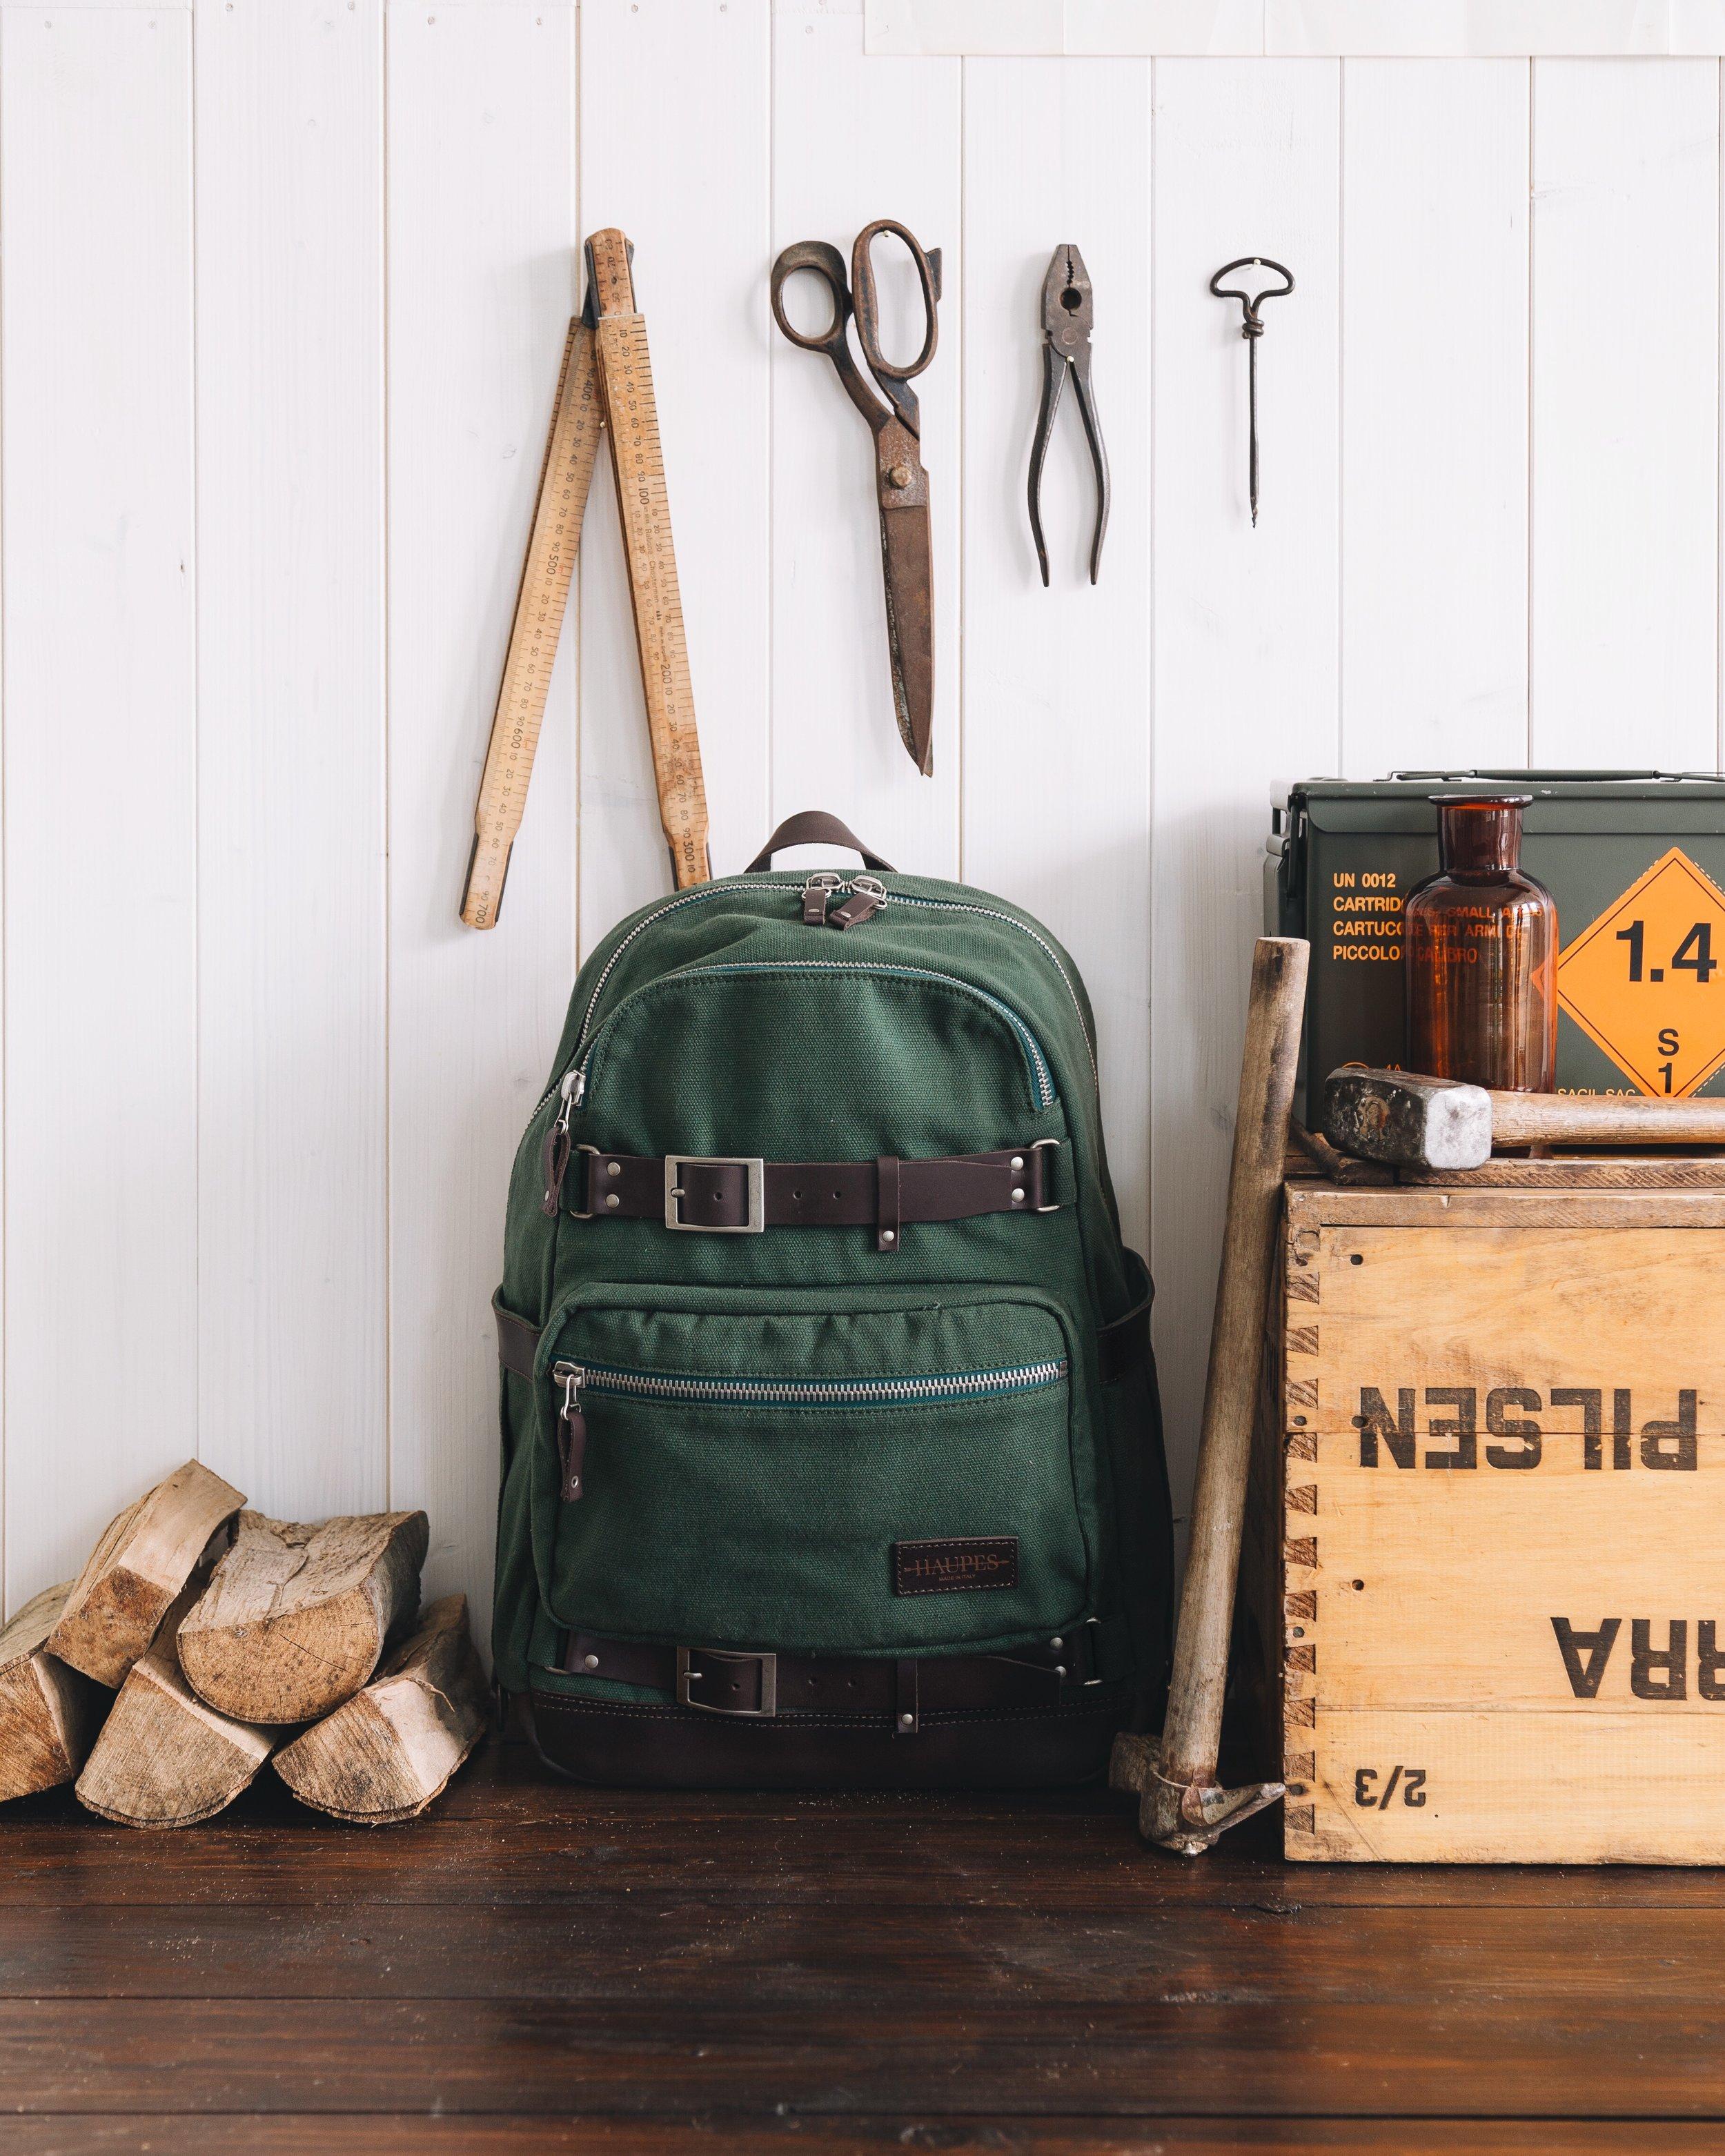 Handbag, Wallet & Purse Repair - Repairing straps, seams, patching, zippers, and more.